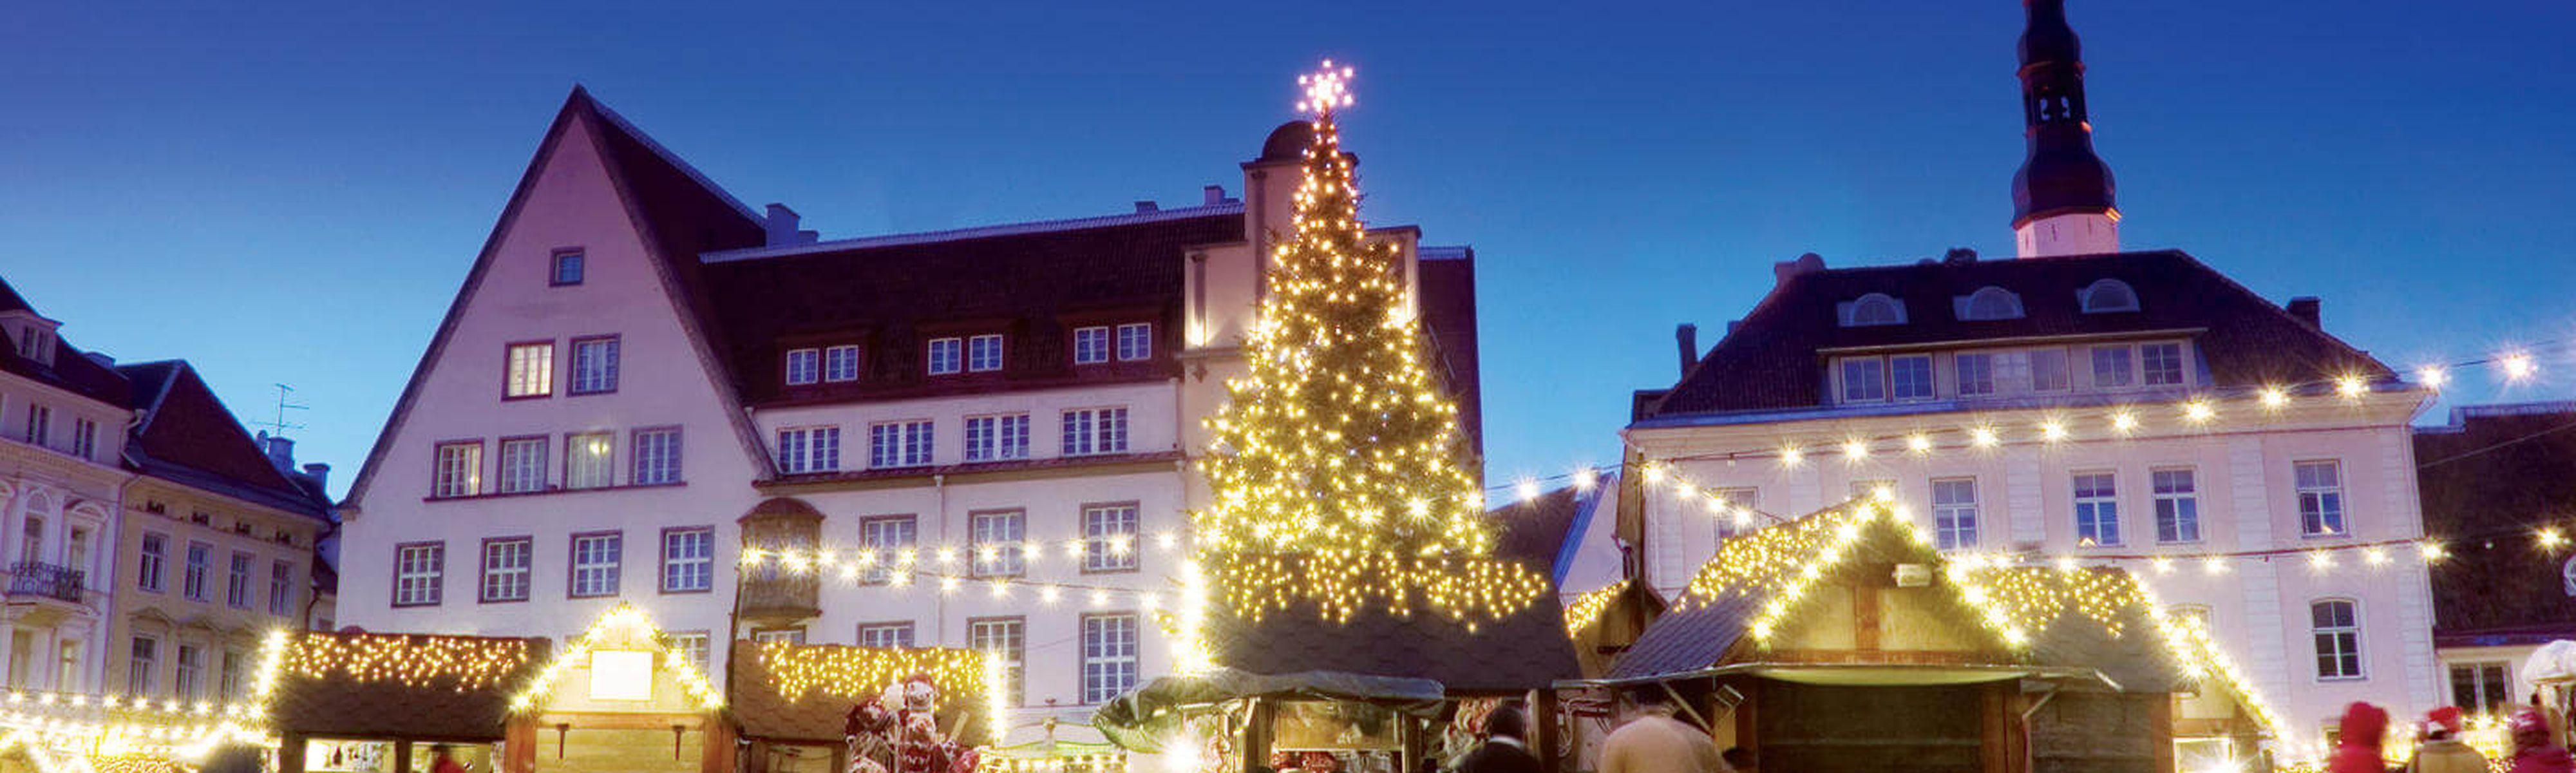 Christmas Markets Of Germany Switzerland Austria Ef Go Ahead